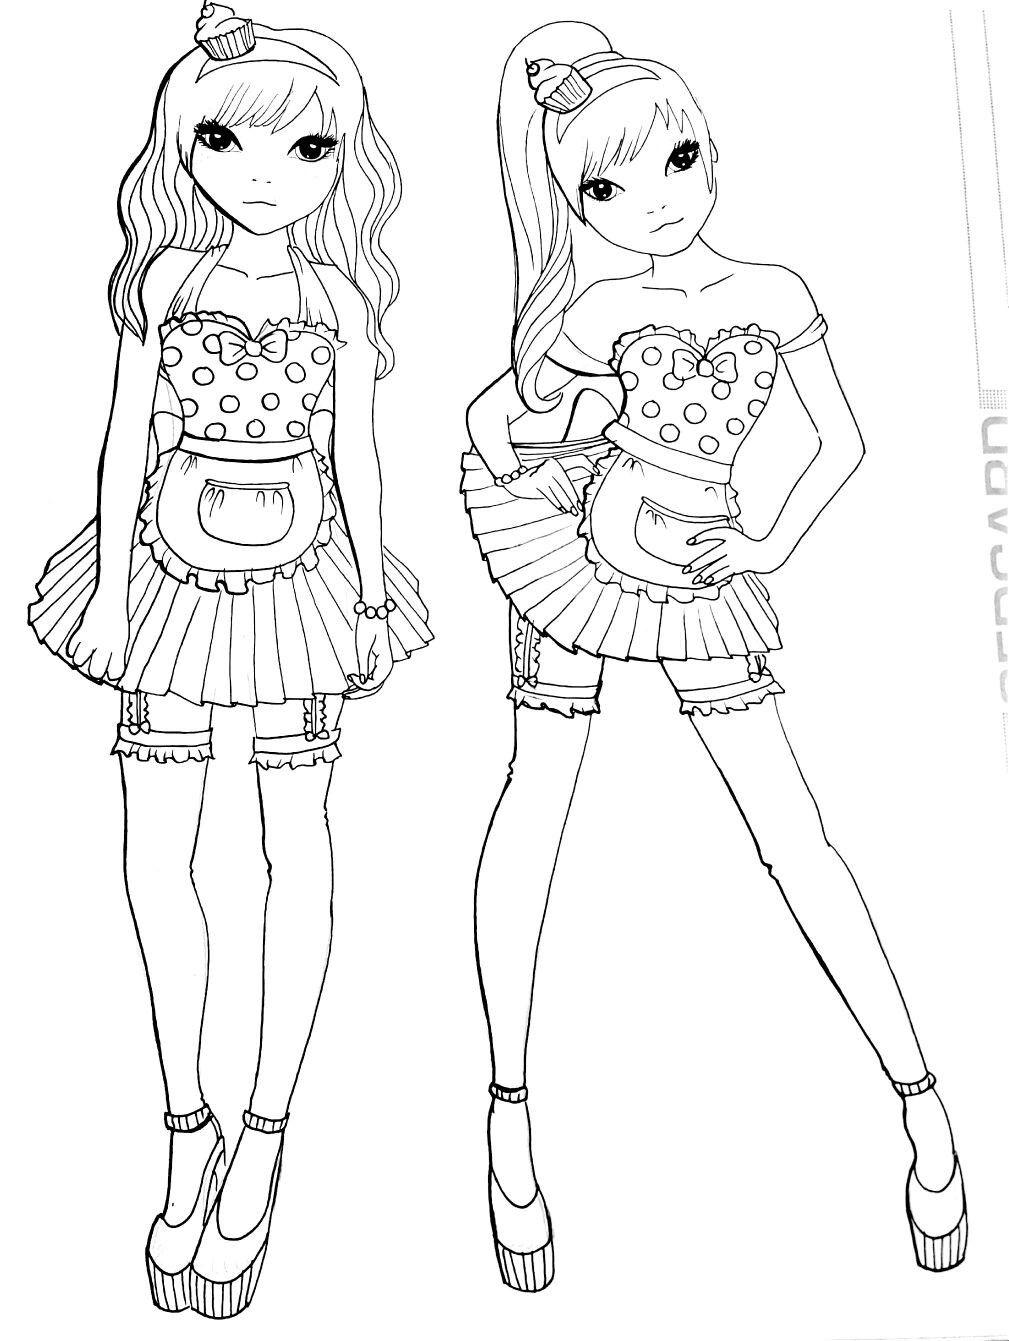 Ausmalbilder Topmodel : Pin By Daidy M On Ausmalbilder Topmodel Pinterest Amigurumi